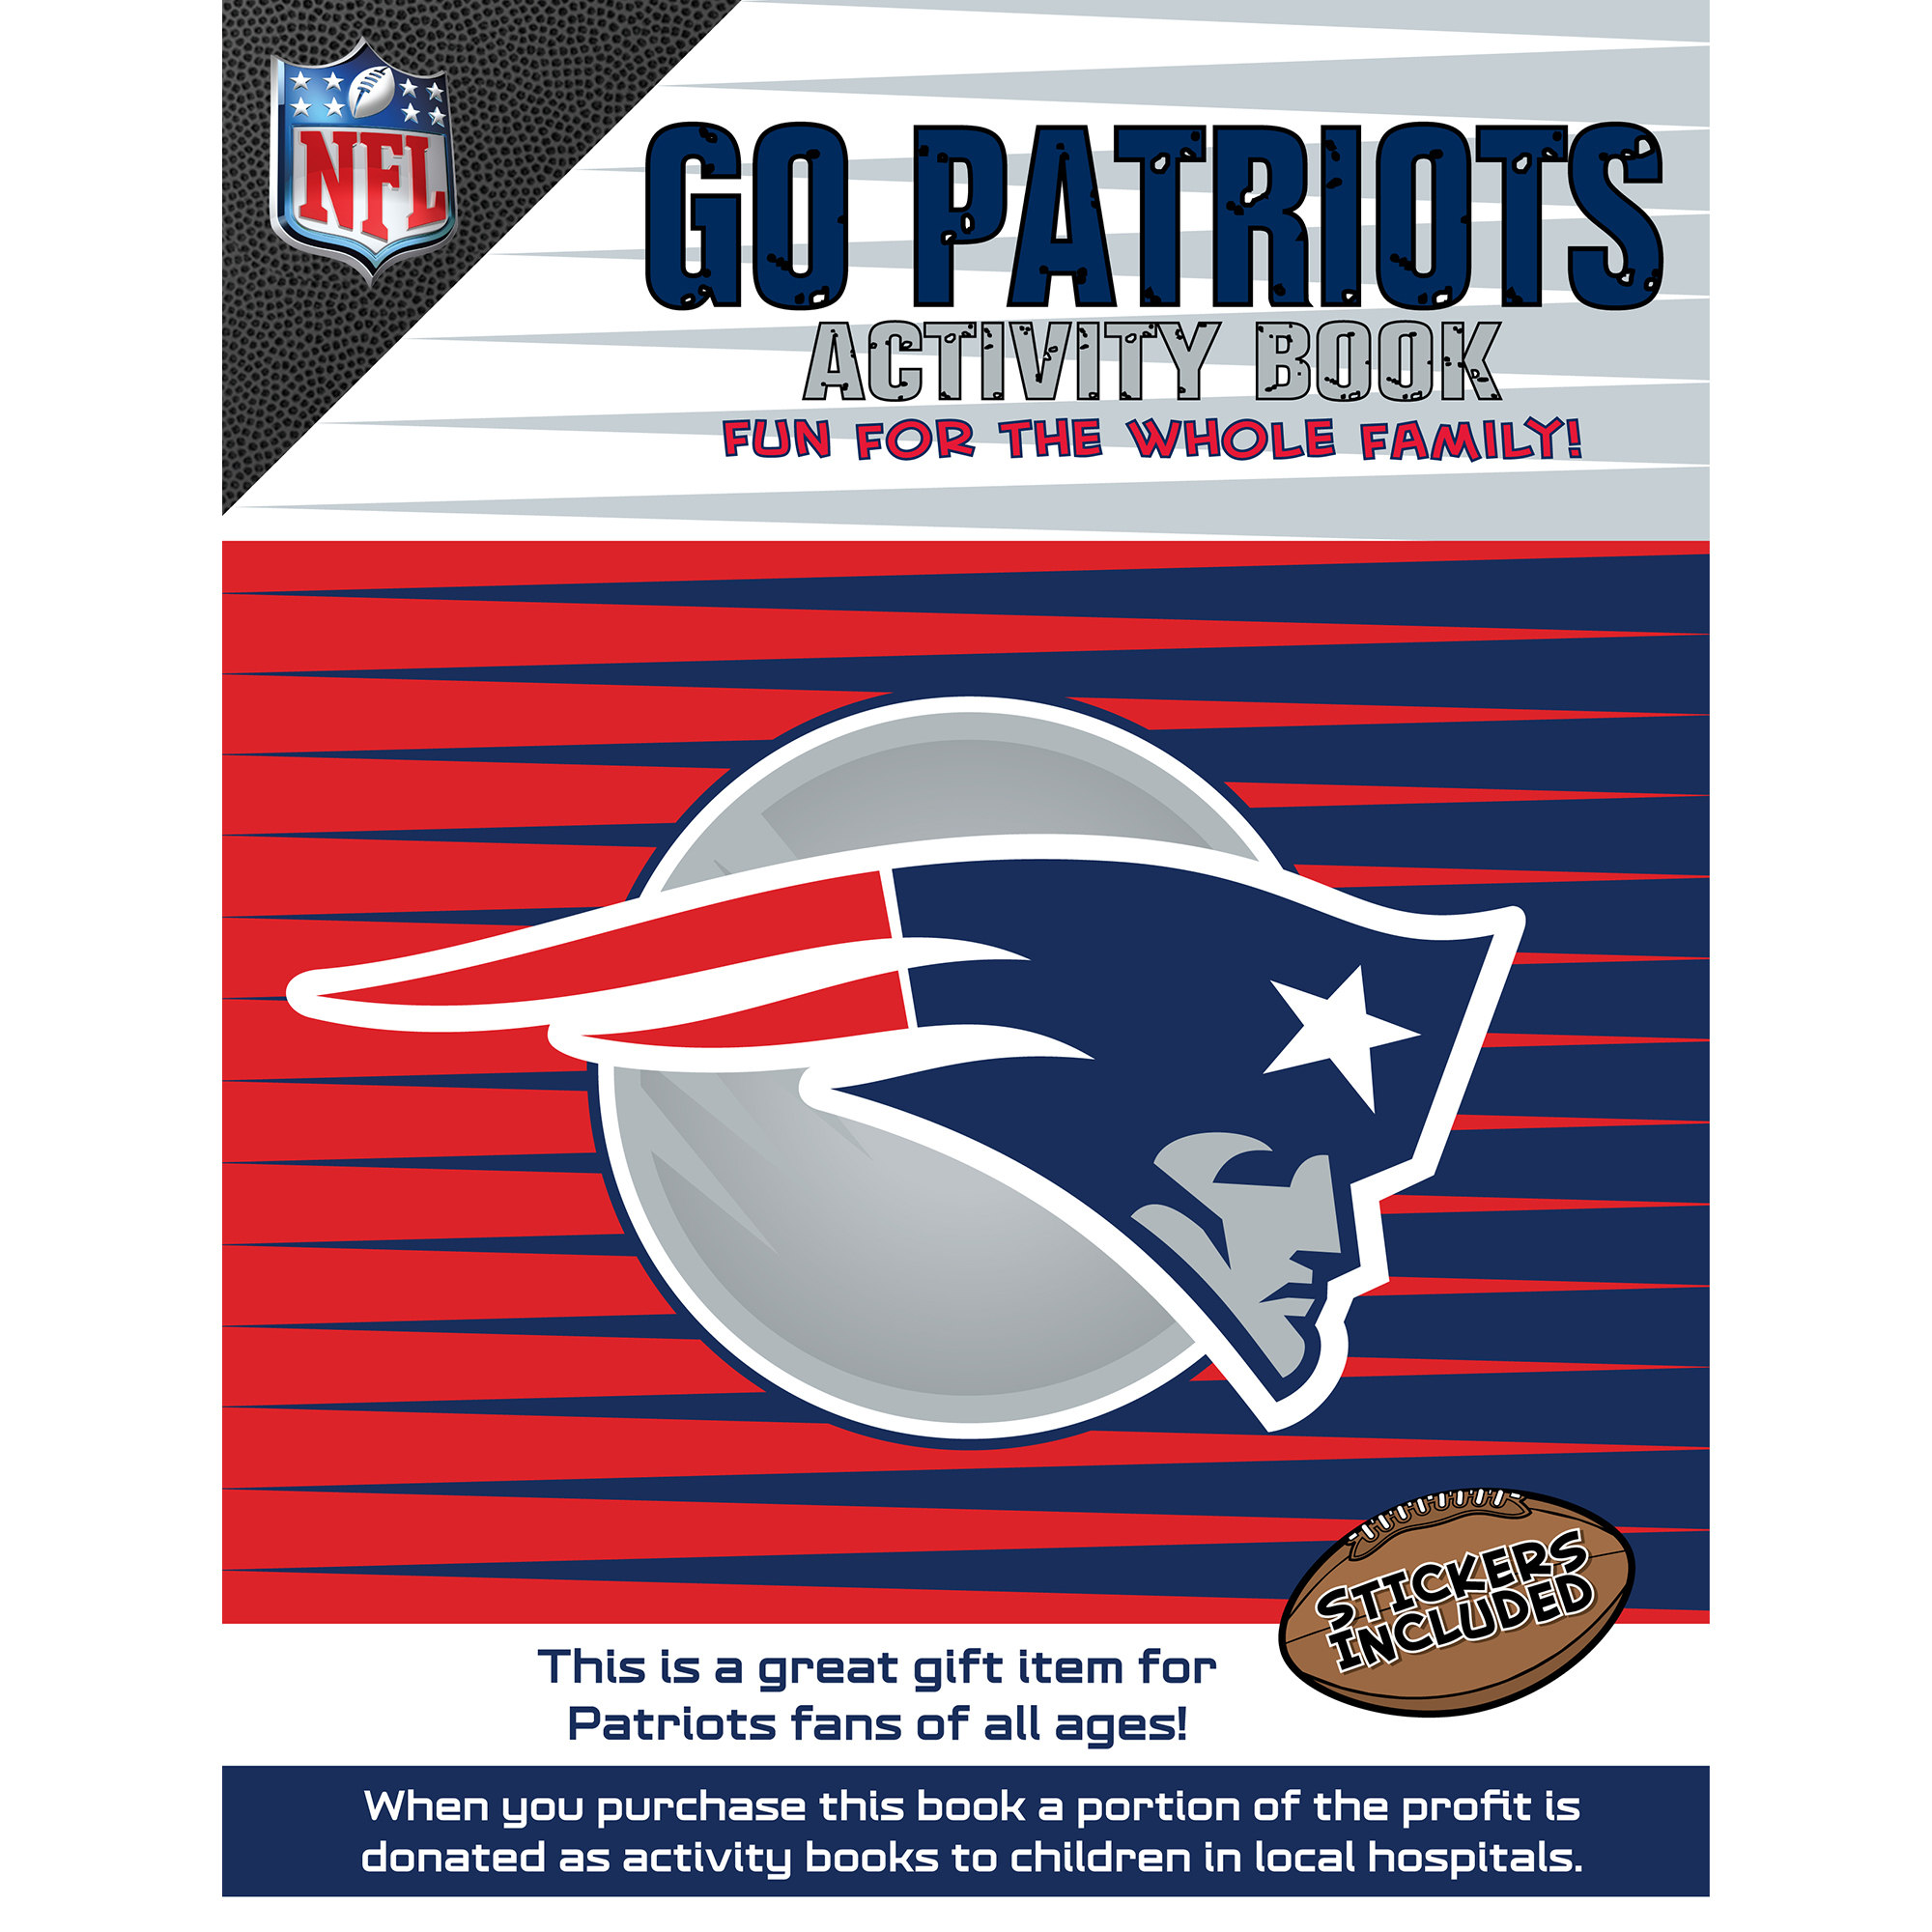 Go Patriots >> Go Patriots Activity Book